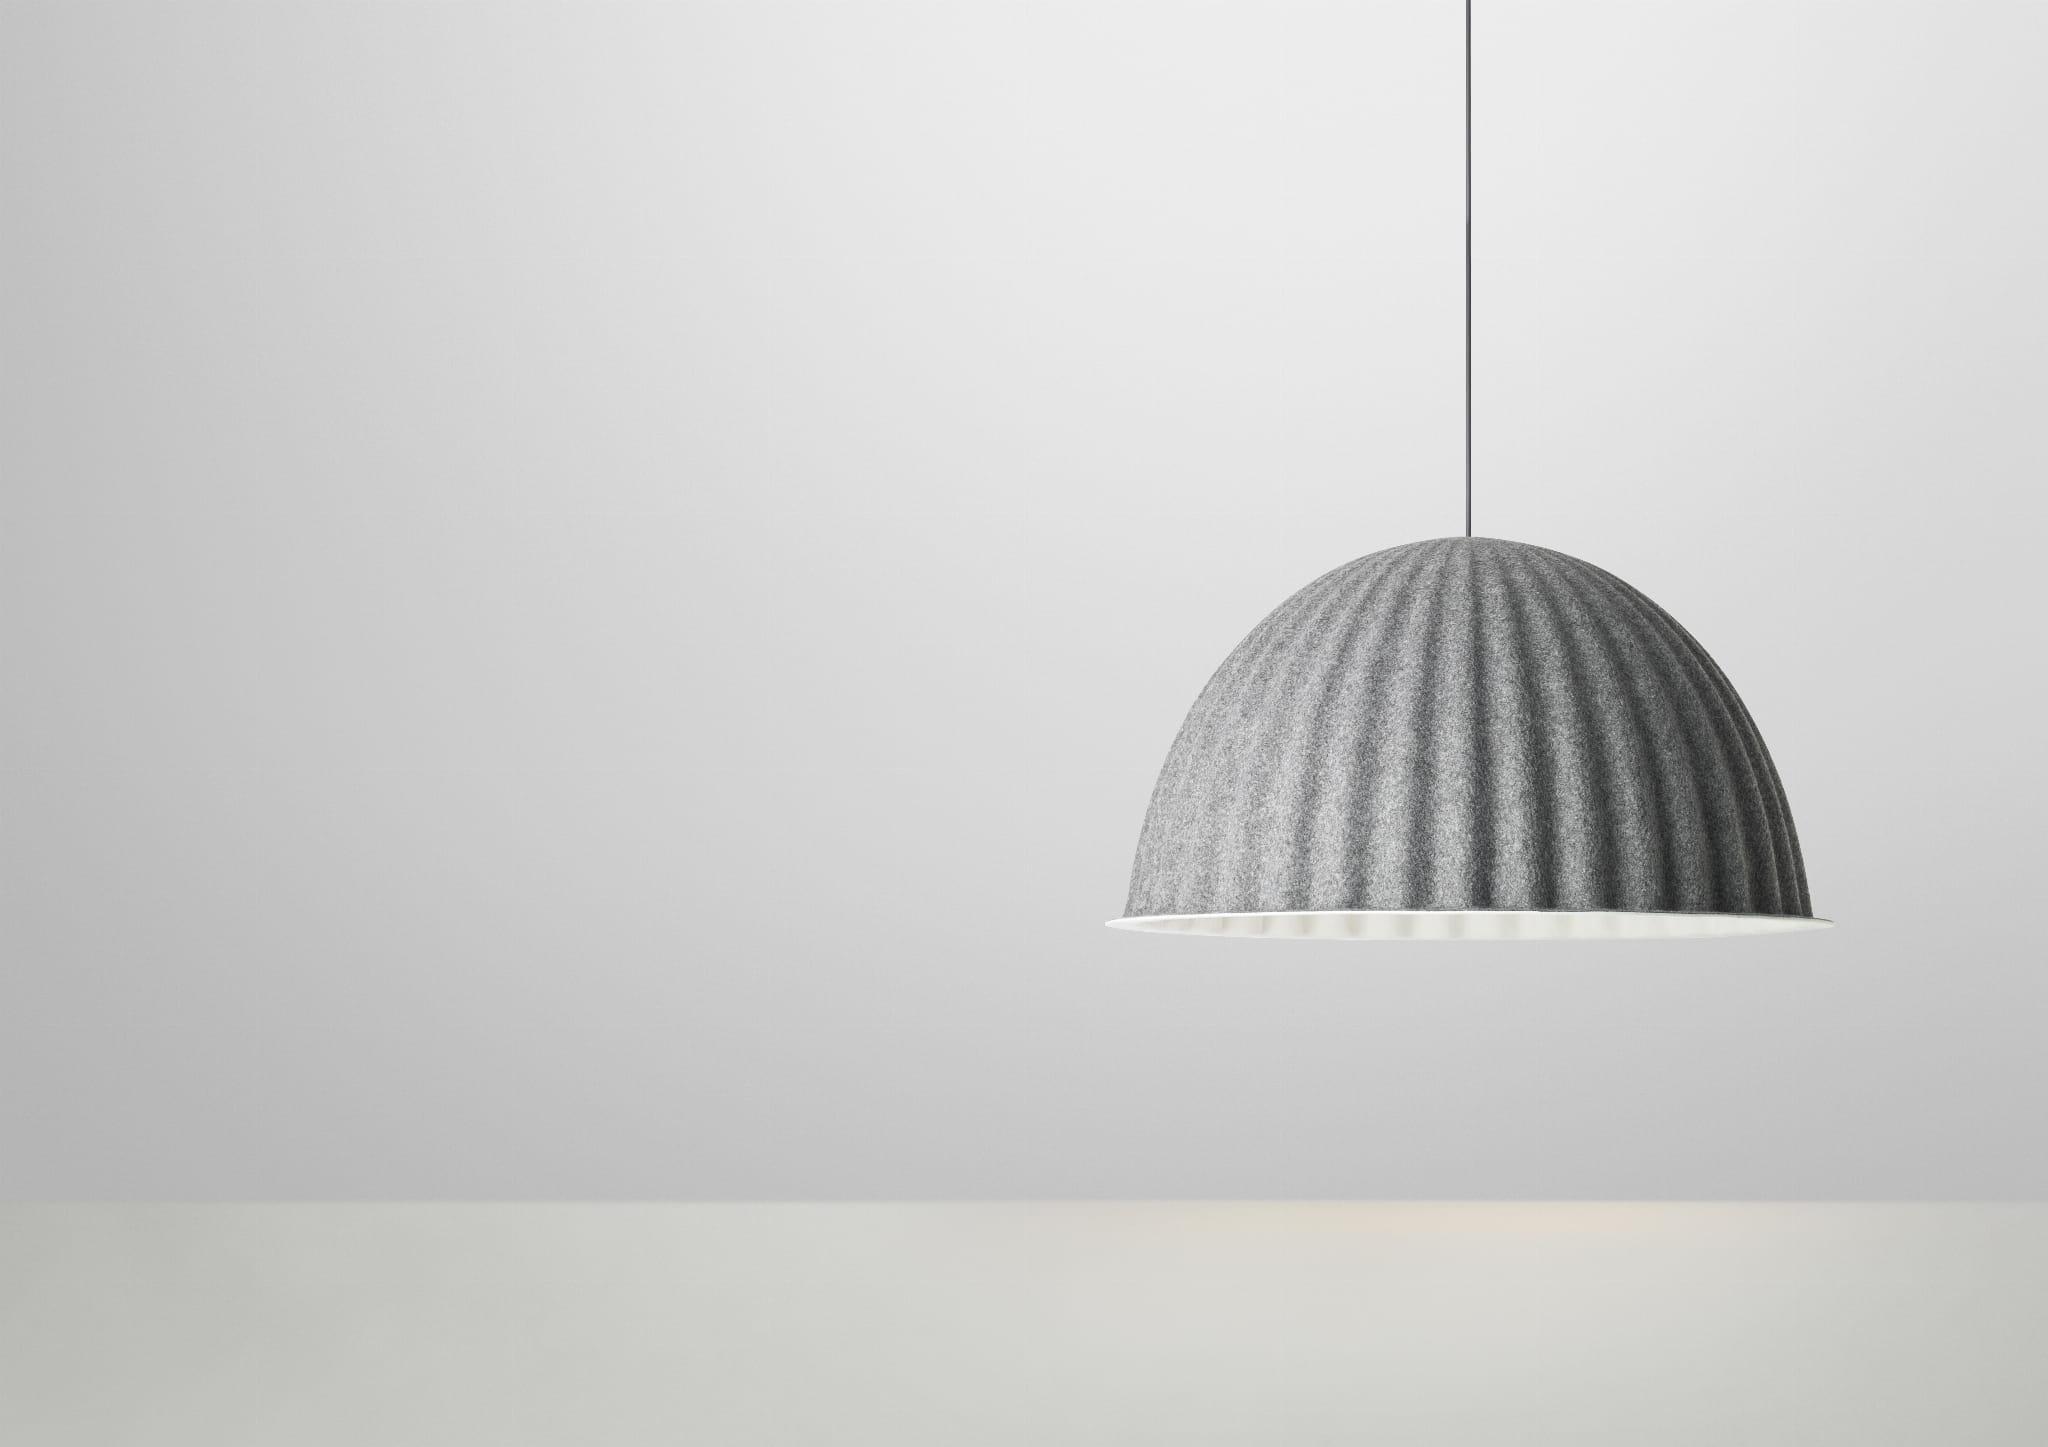 Modne ubrania MUUTO lampa wisząca UNDER THE BELL by ISKOS-BERLIN ⌀82 szara QX81